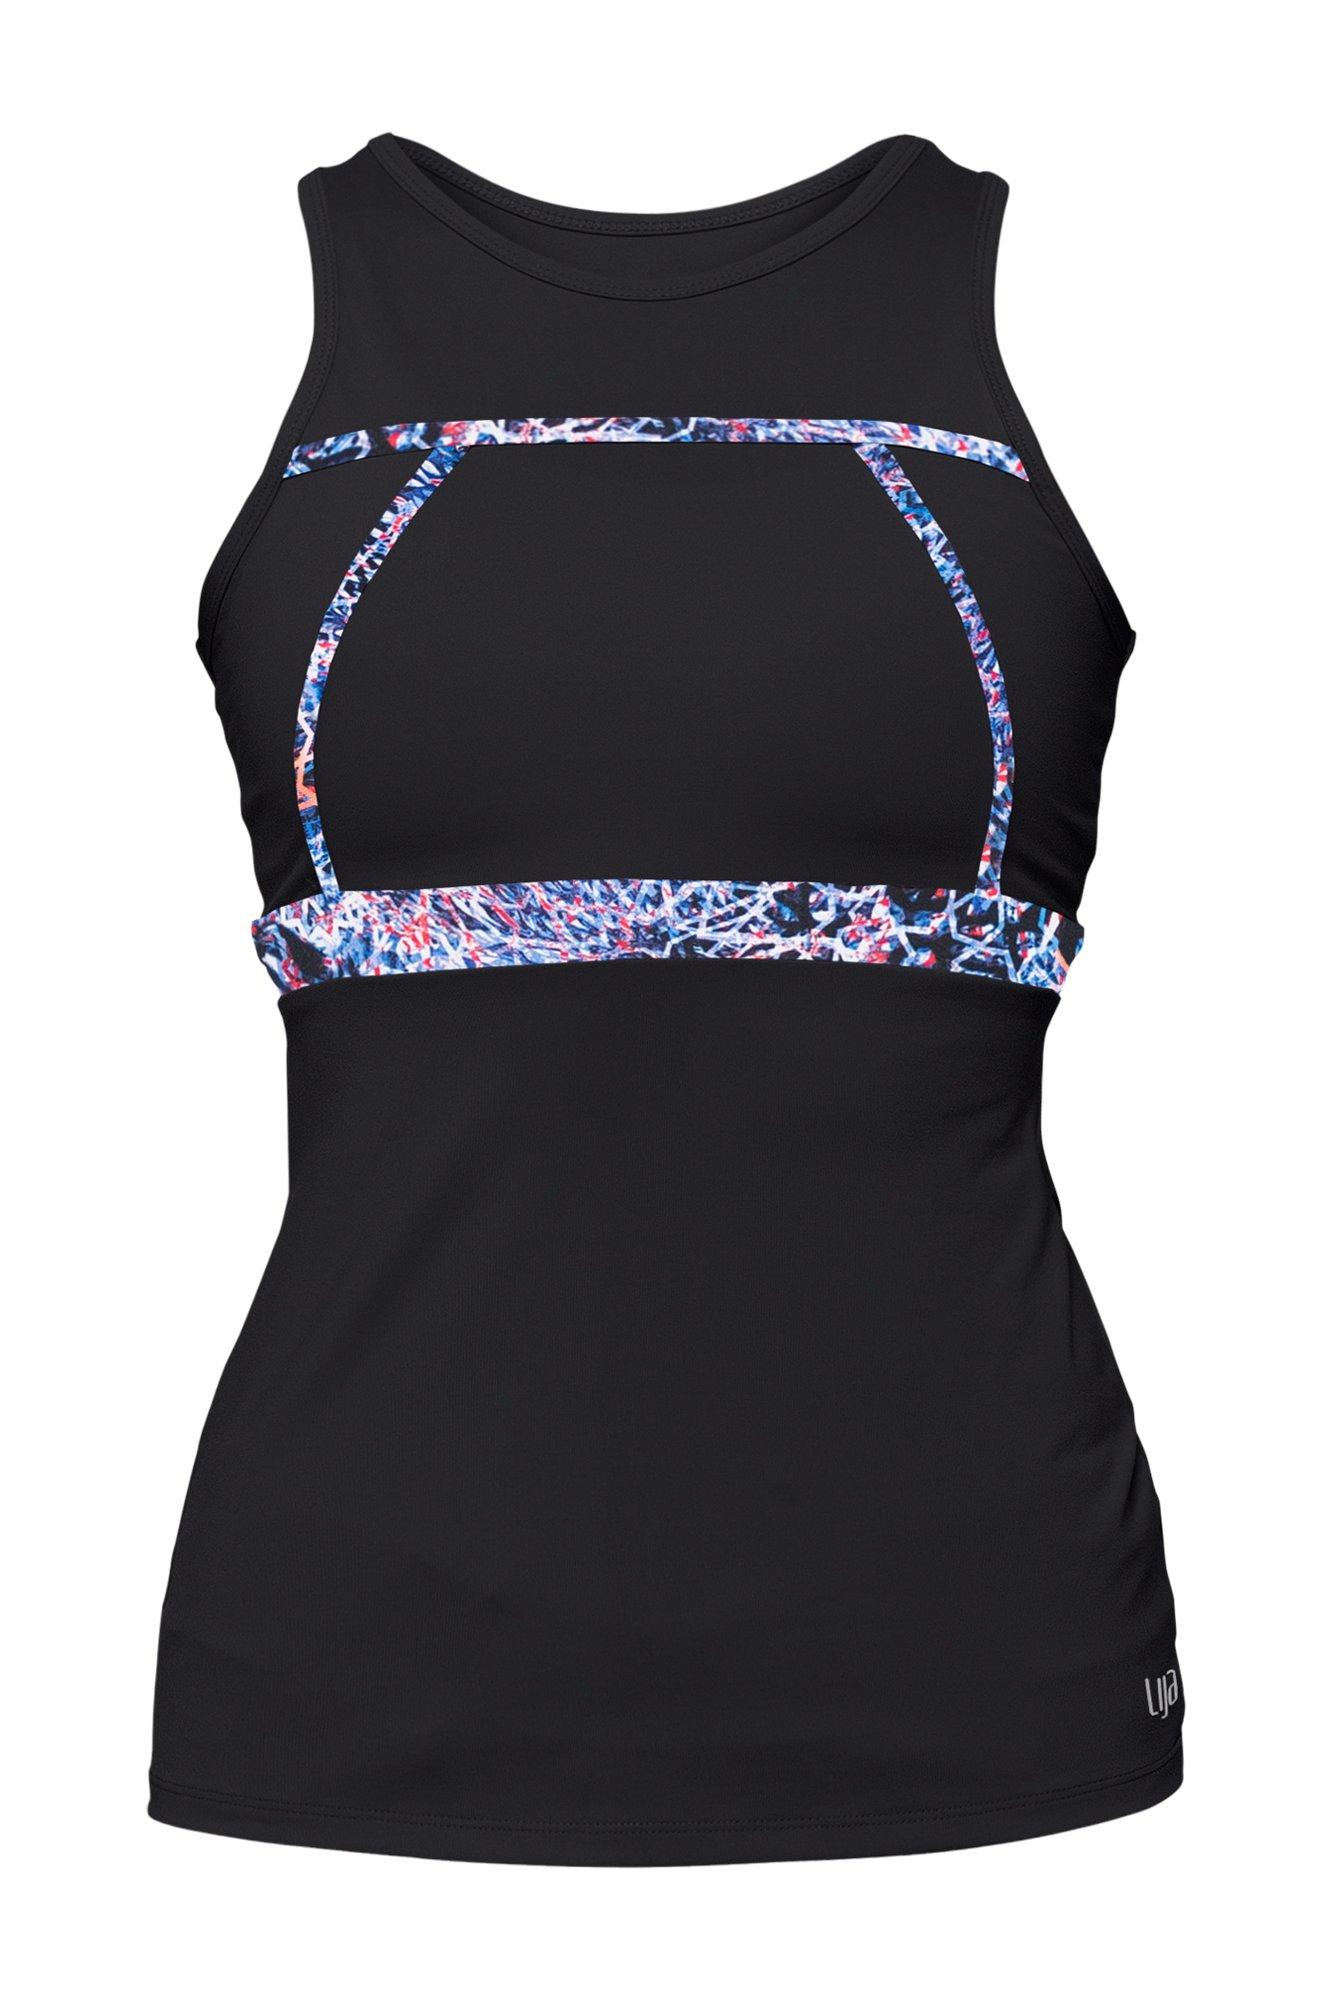 Lija Women's Compression First Lap Tank Top, Black/Babylon Print, Small